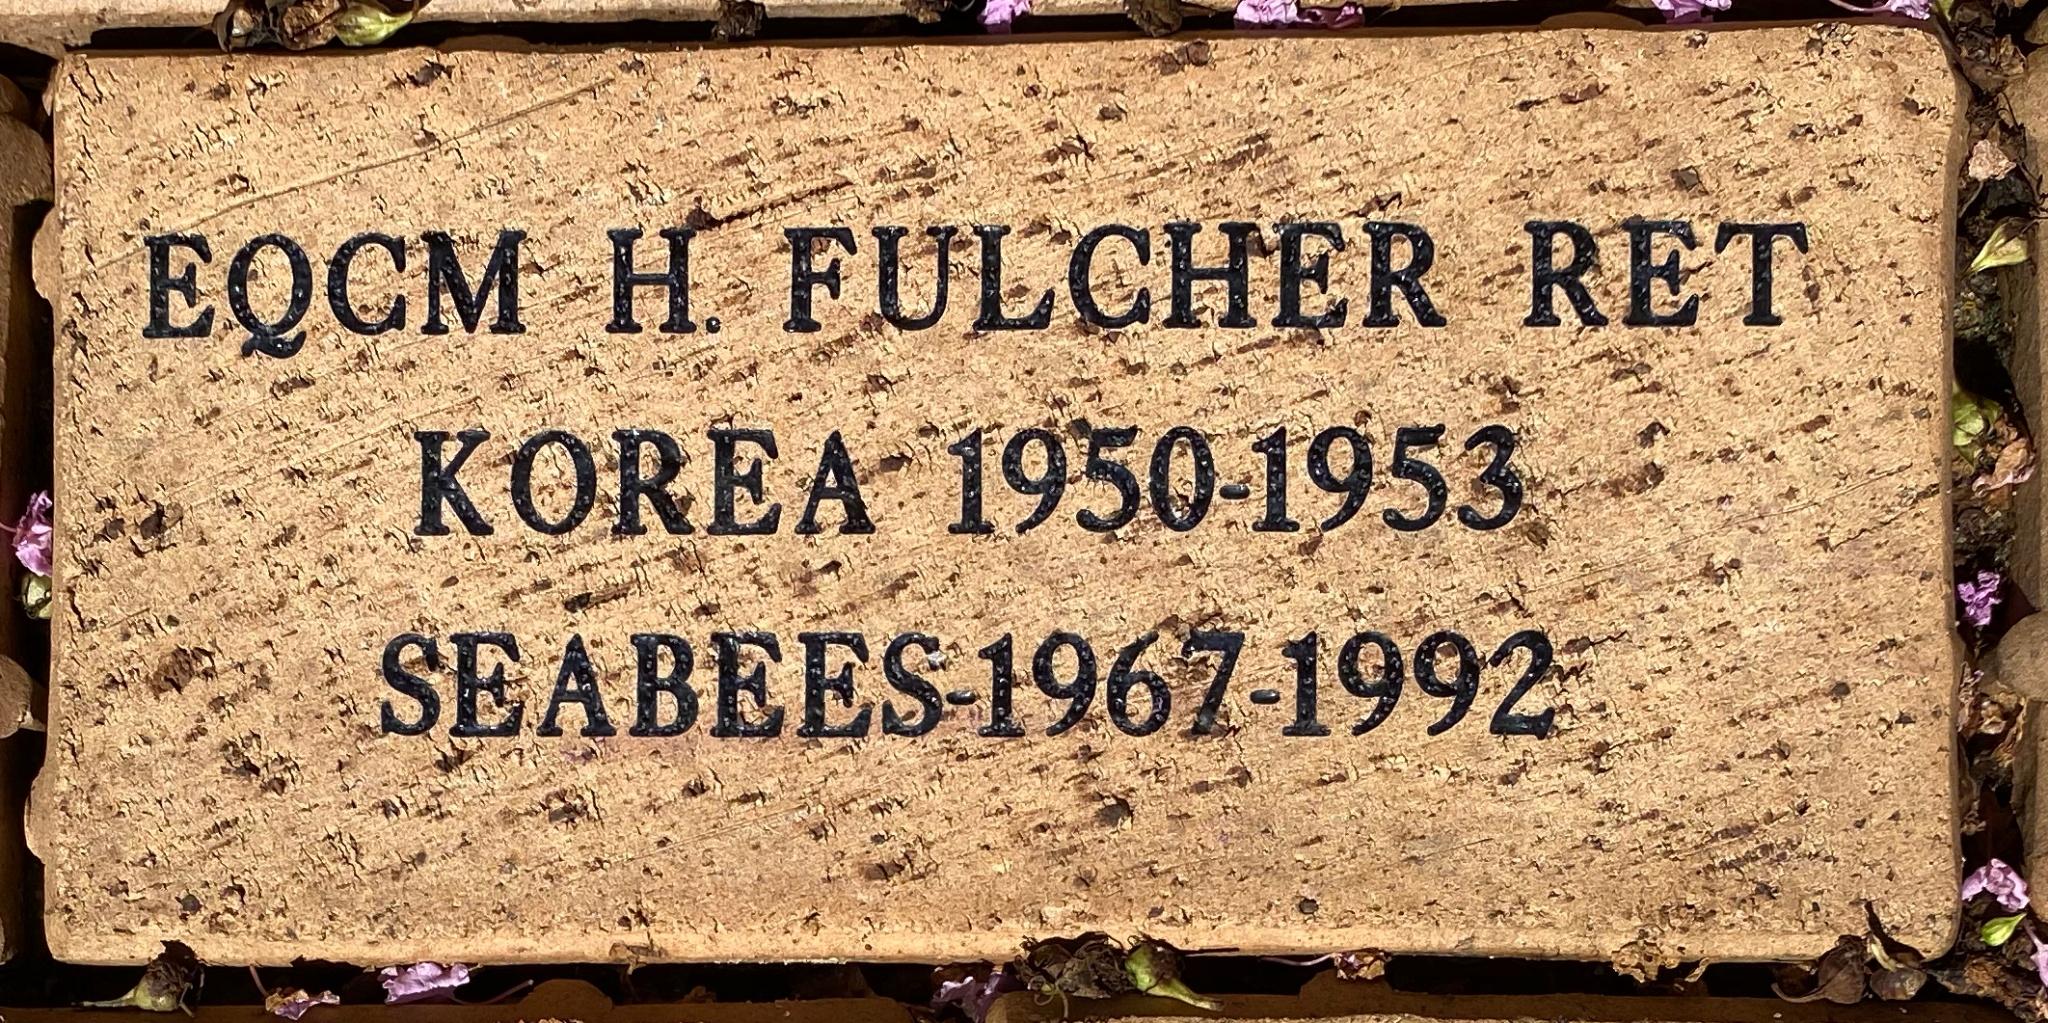 EQCM H. FULCHER RET KOREA 1950-1953 SEABEES- 1967-1992